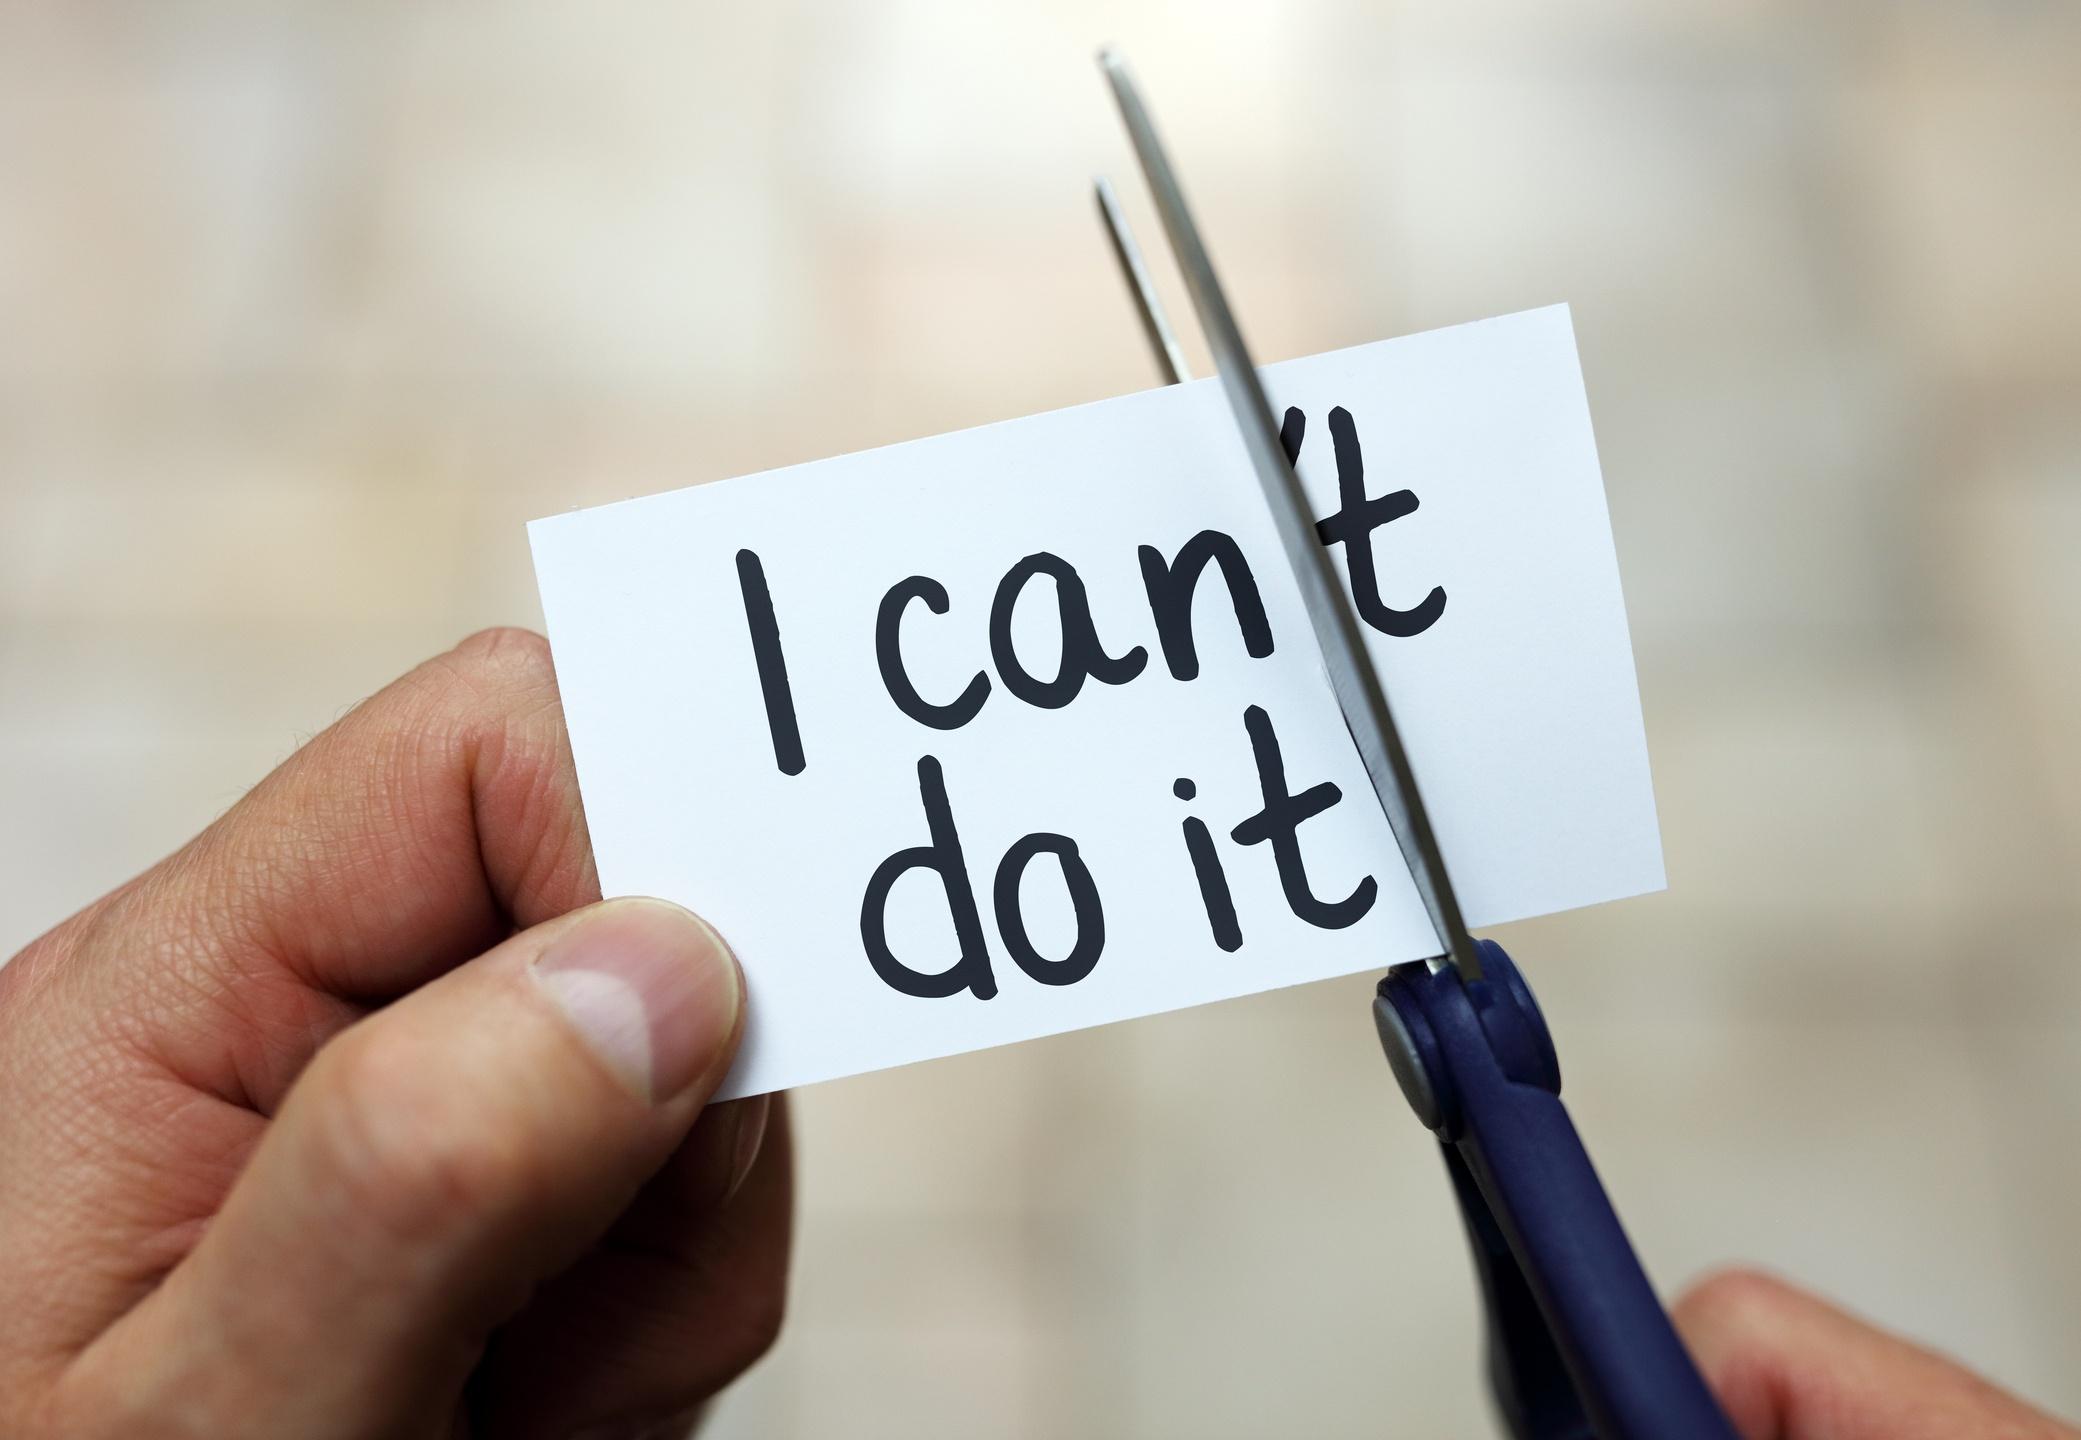 ThinkstockPhotos-I can do it.jpg